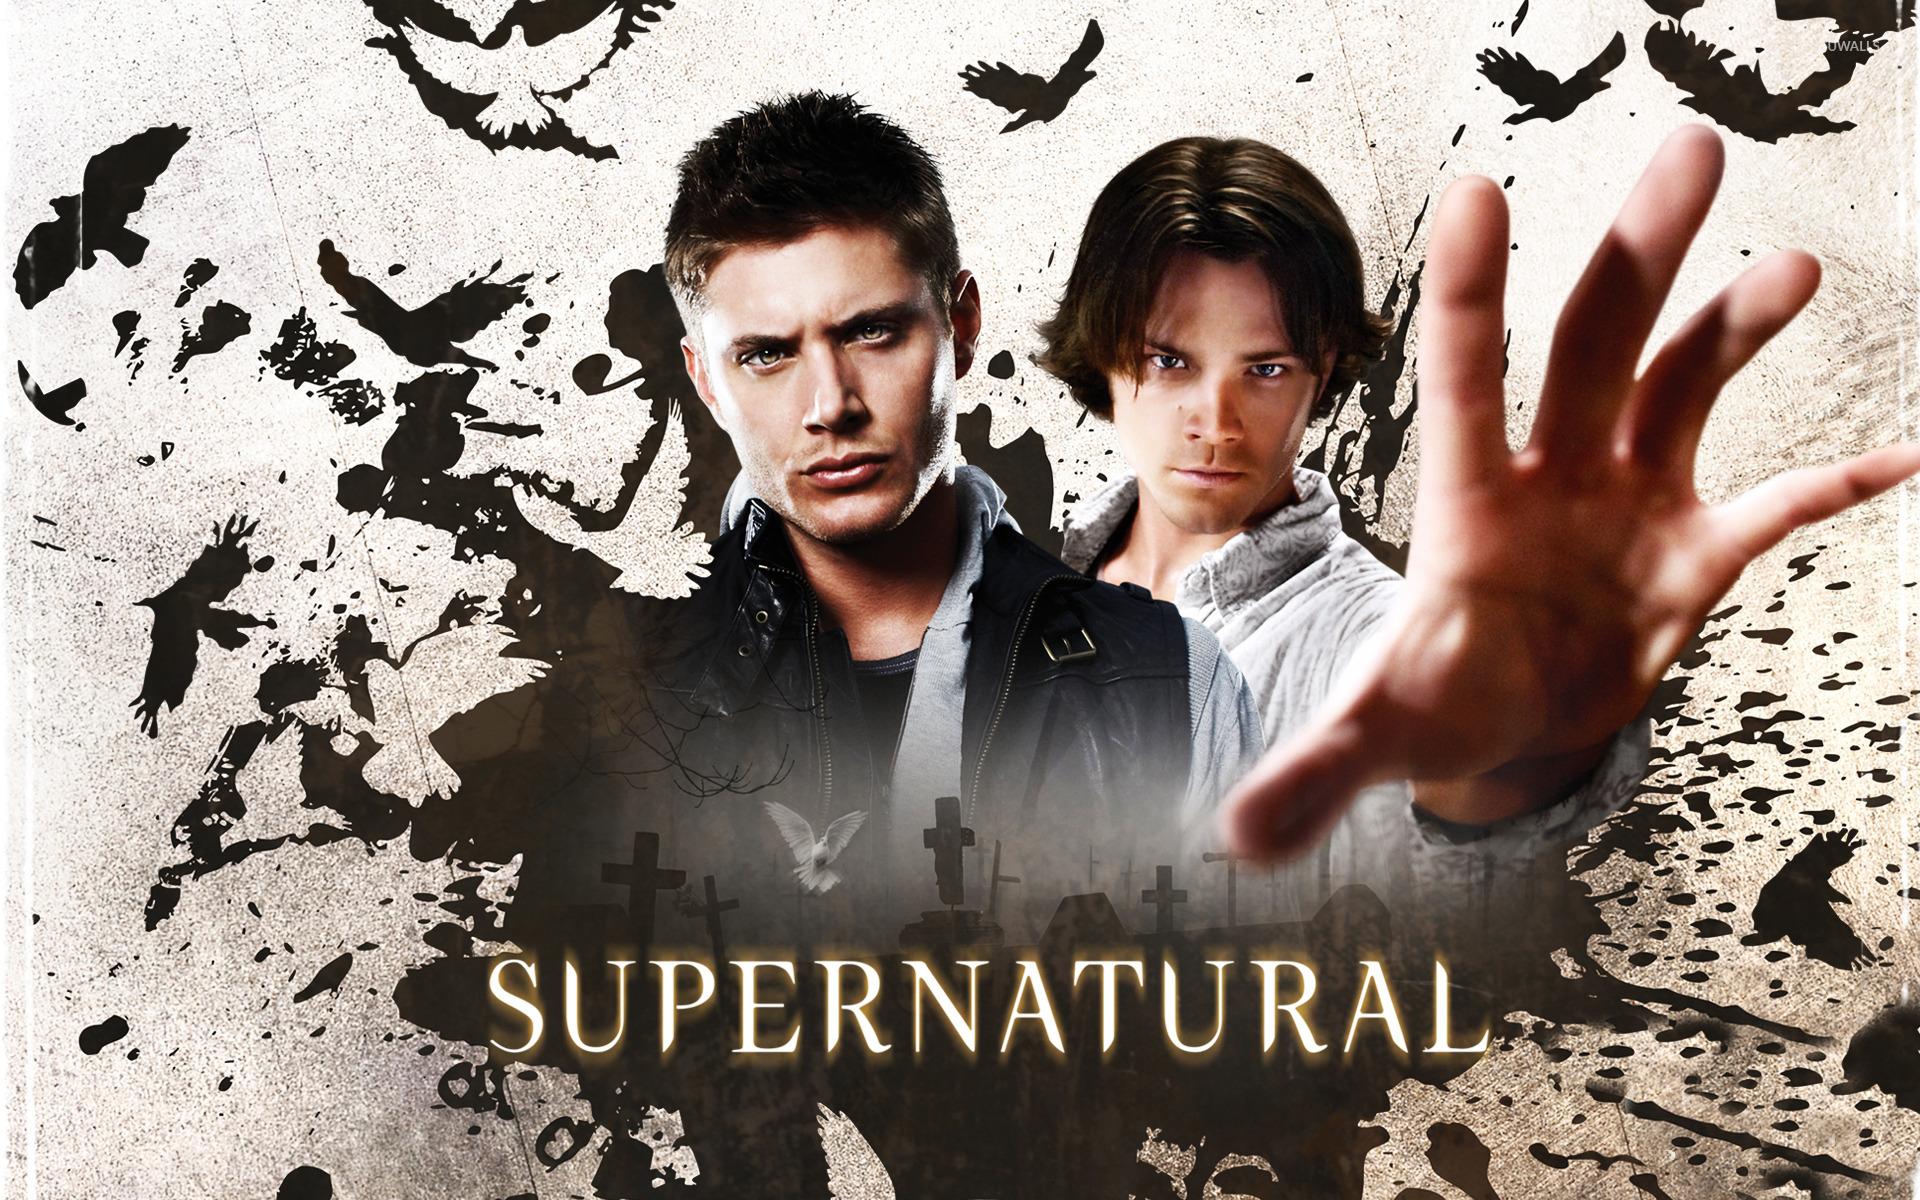 Supernatural 8 wallpaper tv show wallpapers 15005 supernatural 8 wallpaper voltagebd Image collections